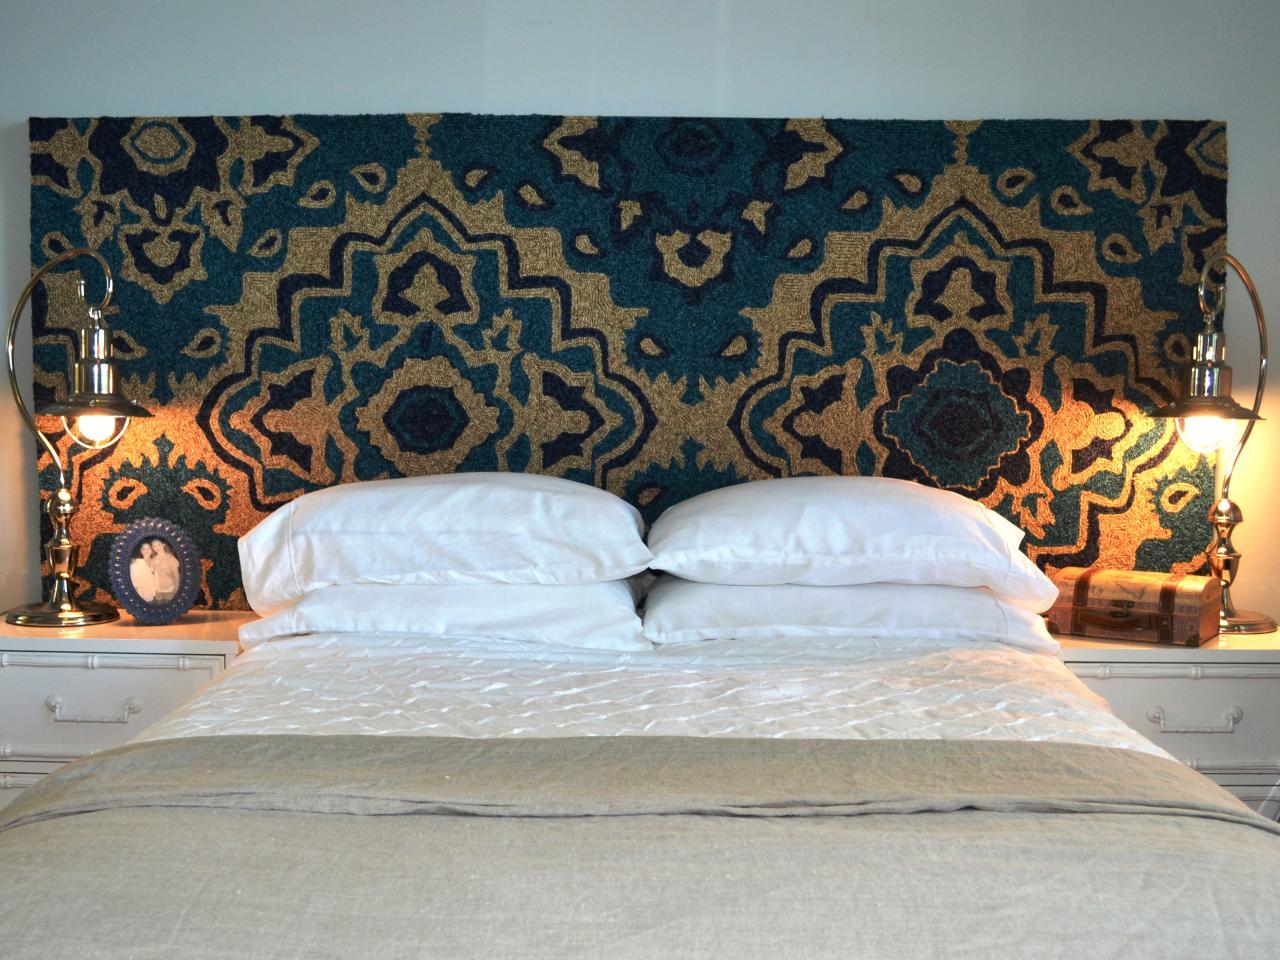 Ковер на стену в изголовье кровати